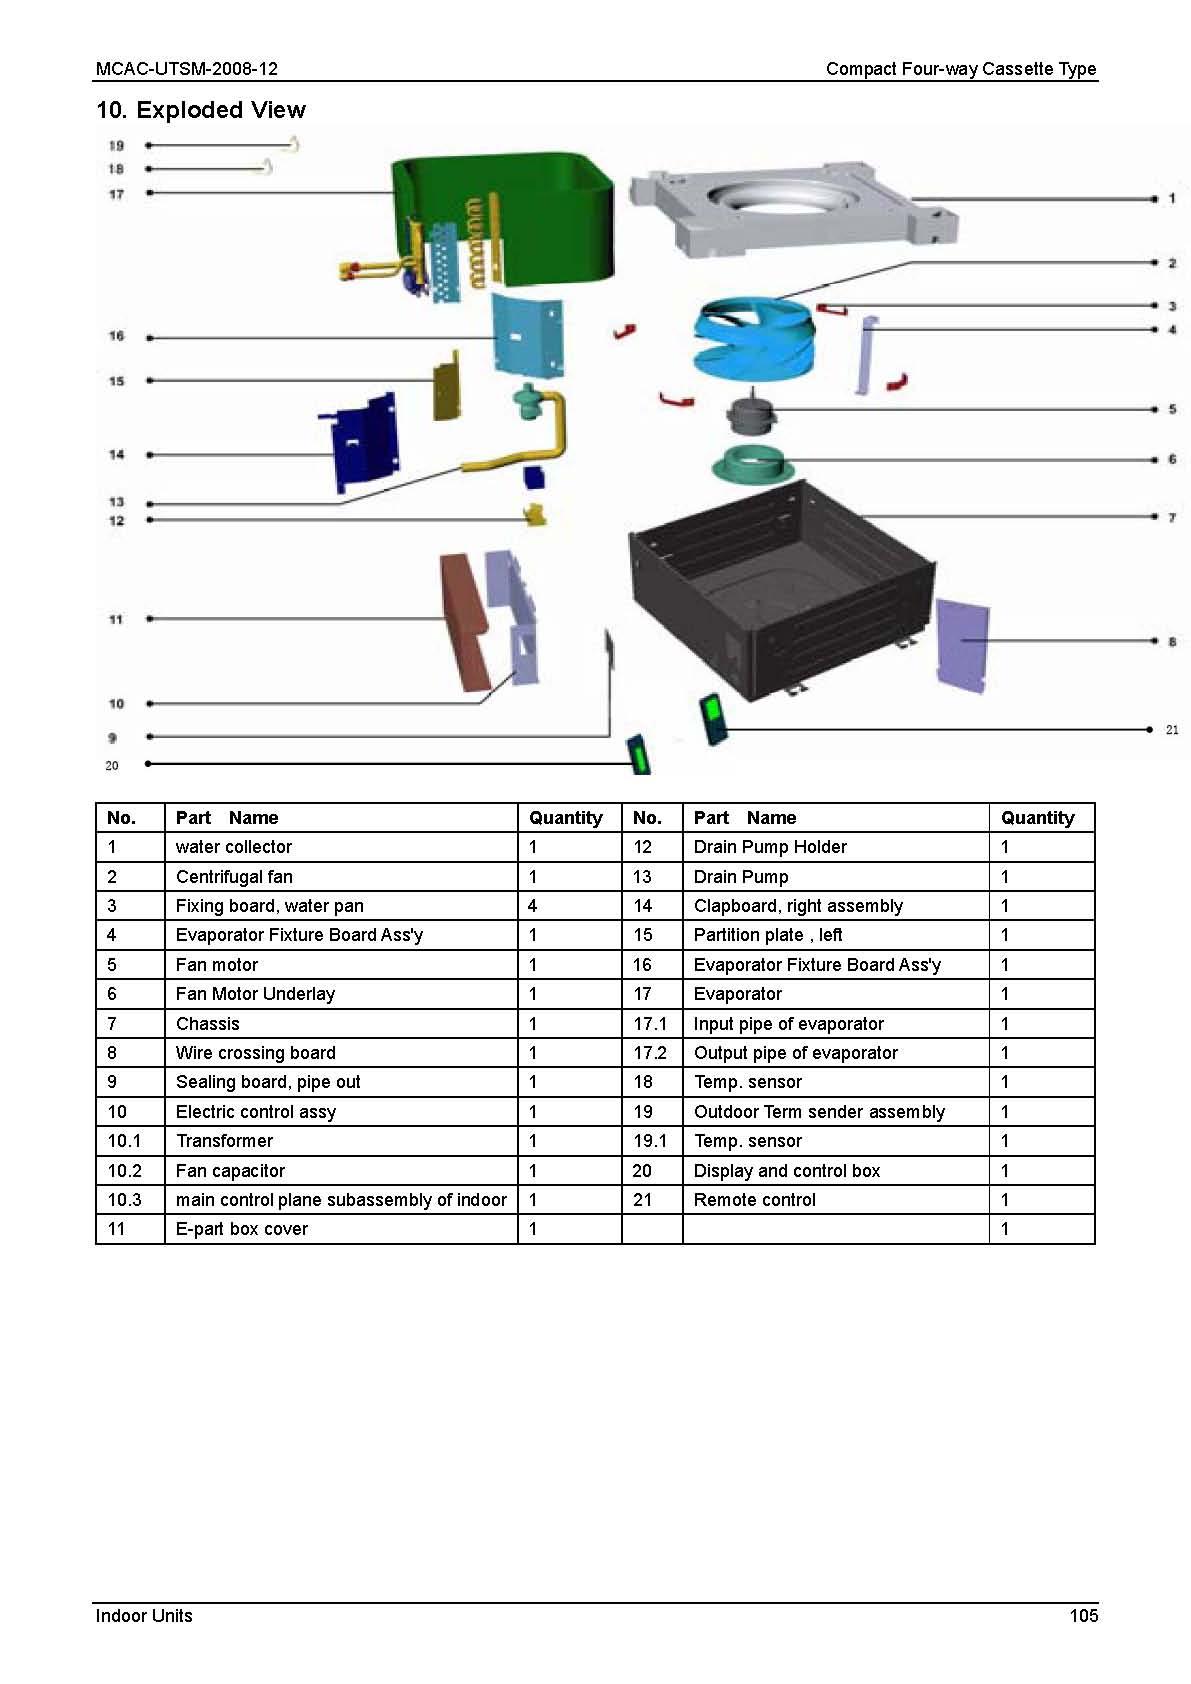 Air Conditioner Air Conditioner Four Way Cassette Air Conditioner #106114